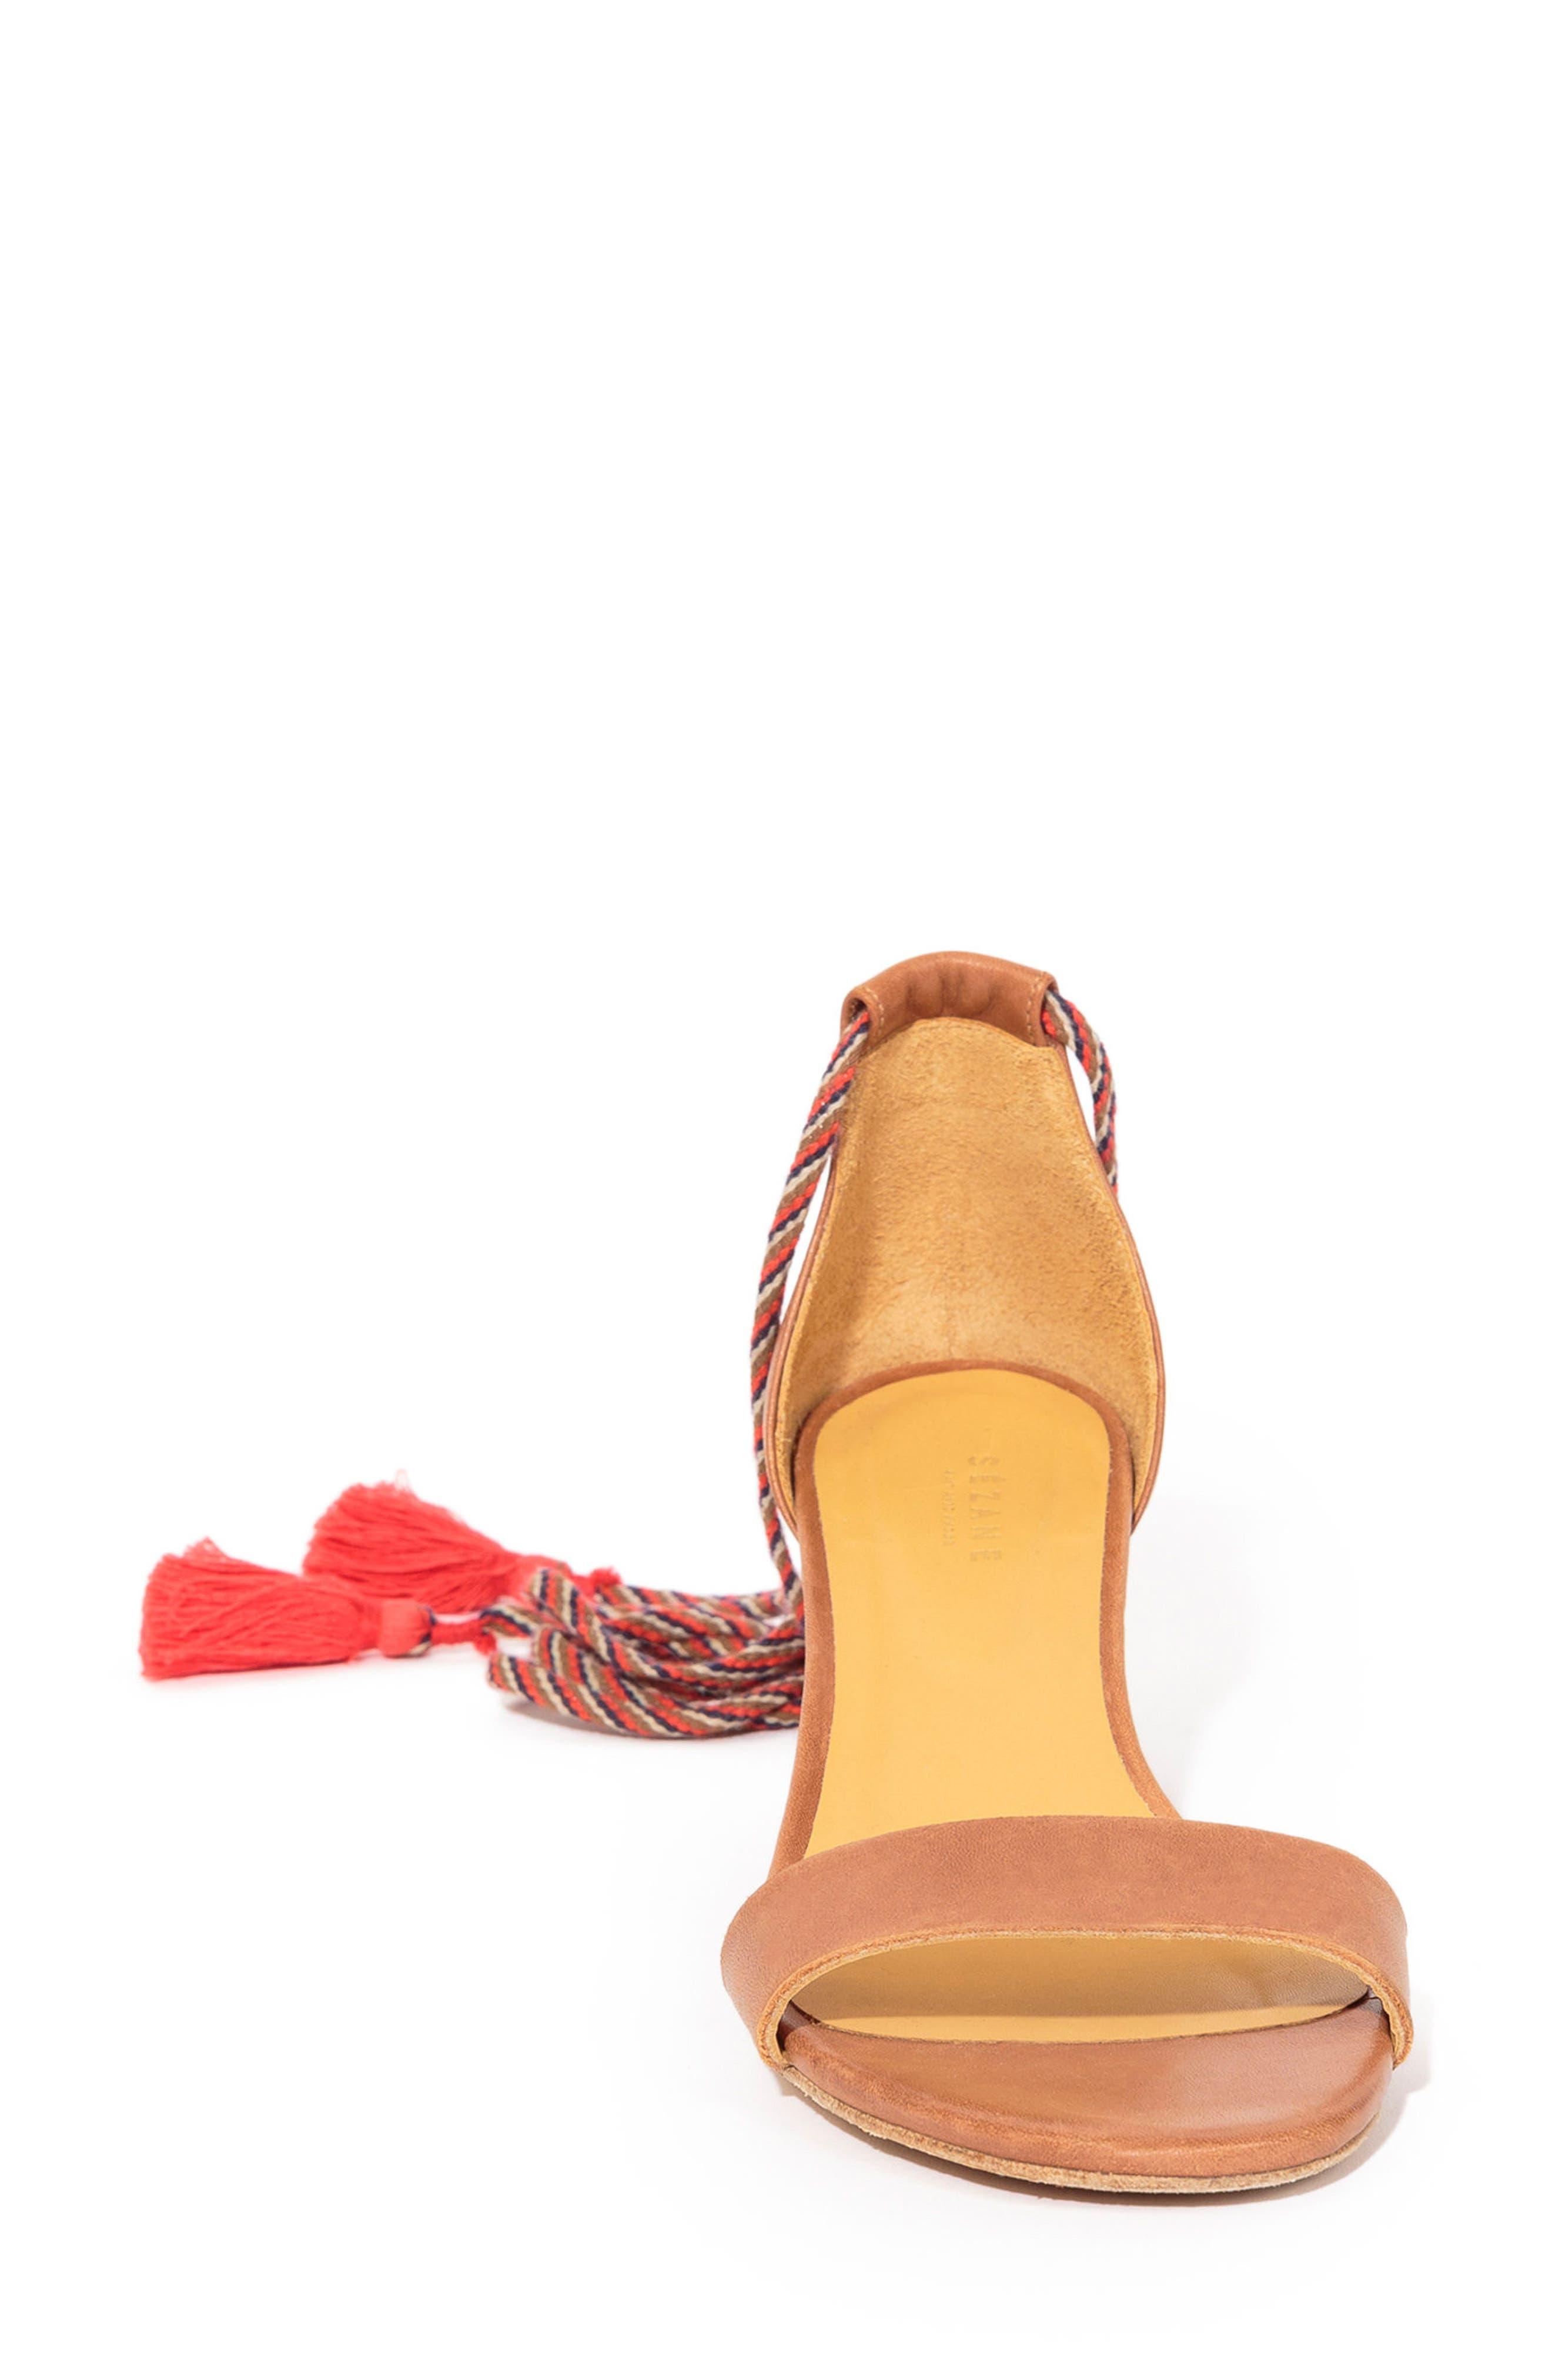 Lorenzo Ankle Wrap Block Heel Sandal,                             Alternate thumbnail 3, color,                             CAMEL LEATHER